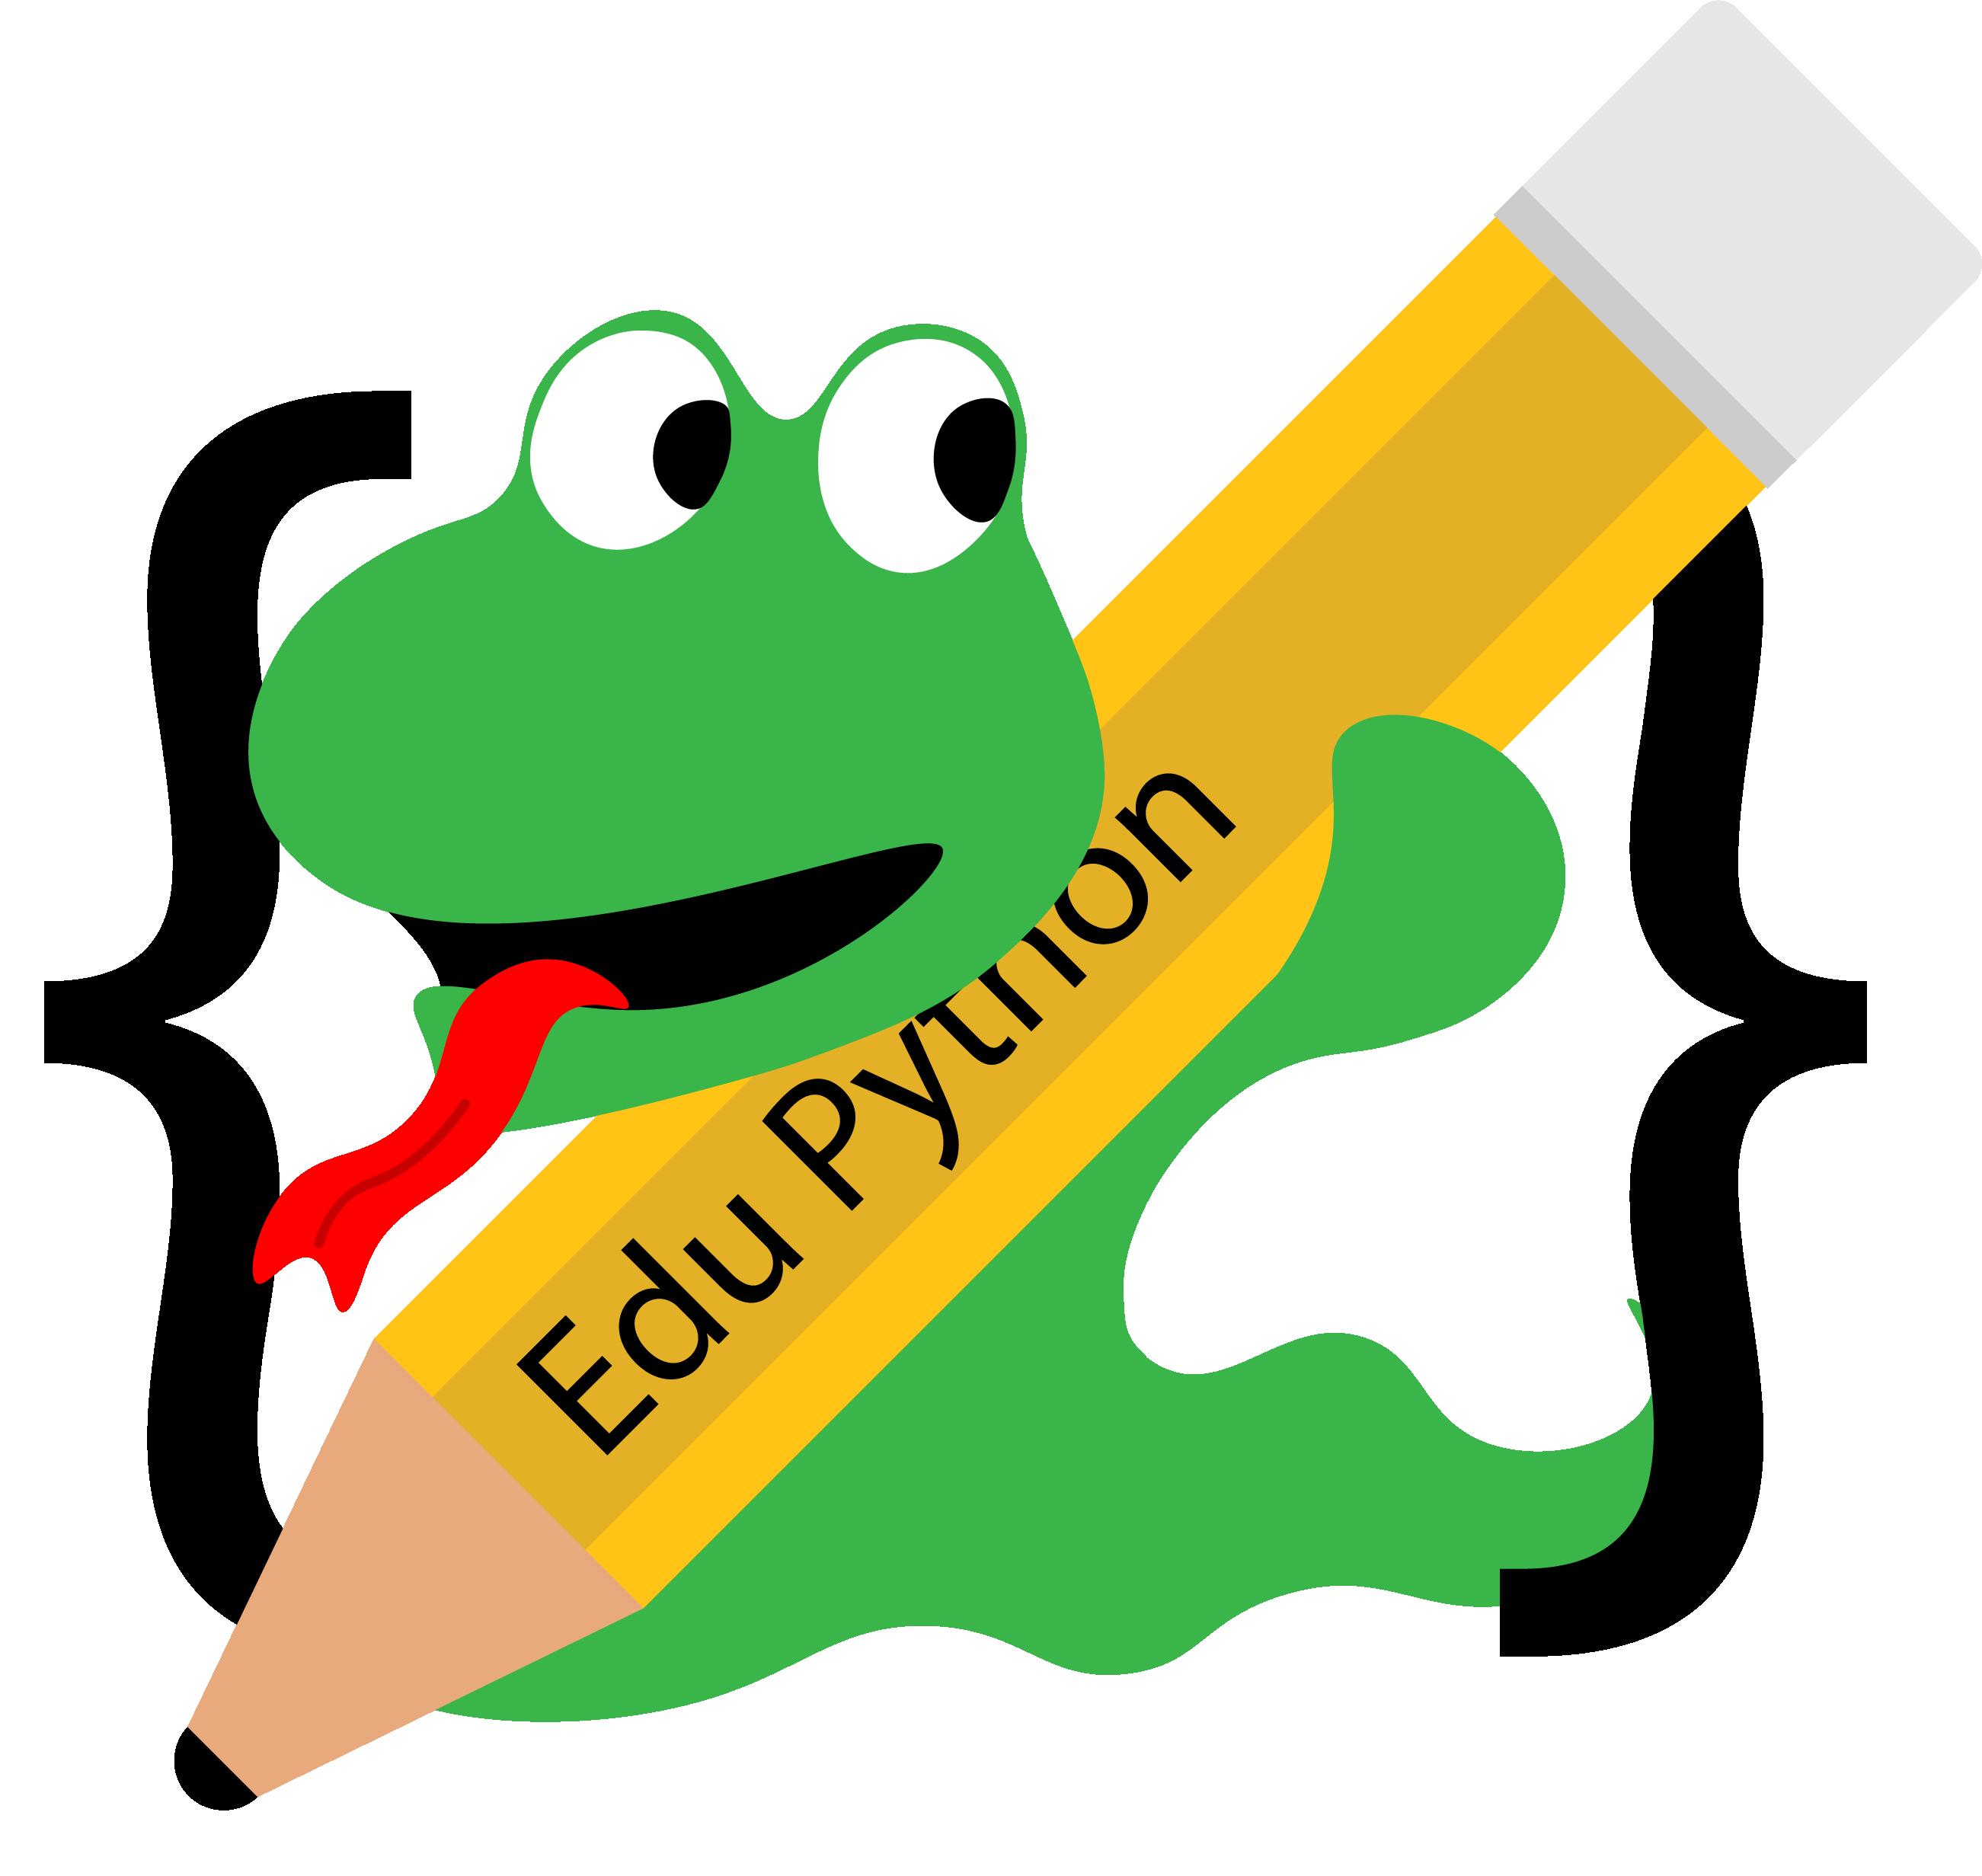 edupython gratuit